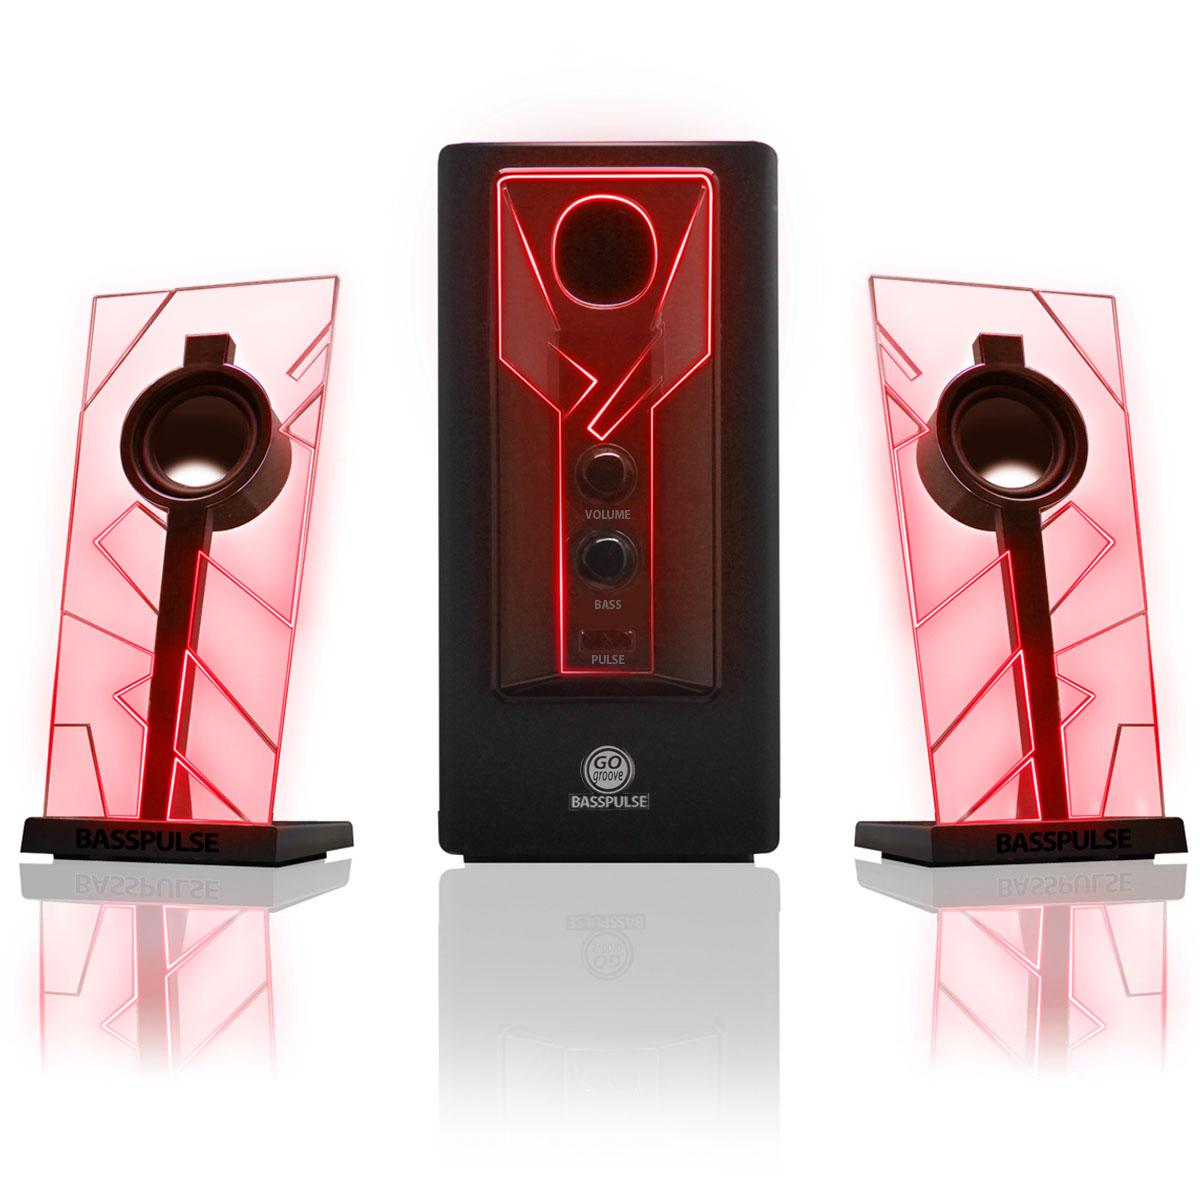 GOgroove BassPULSE Computer Speaker Sound System with